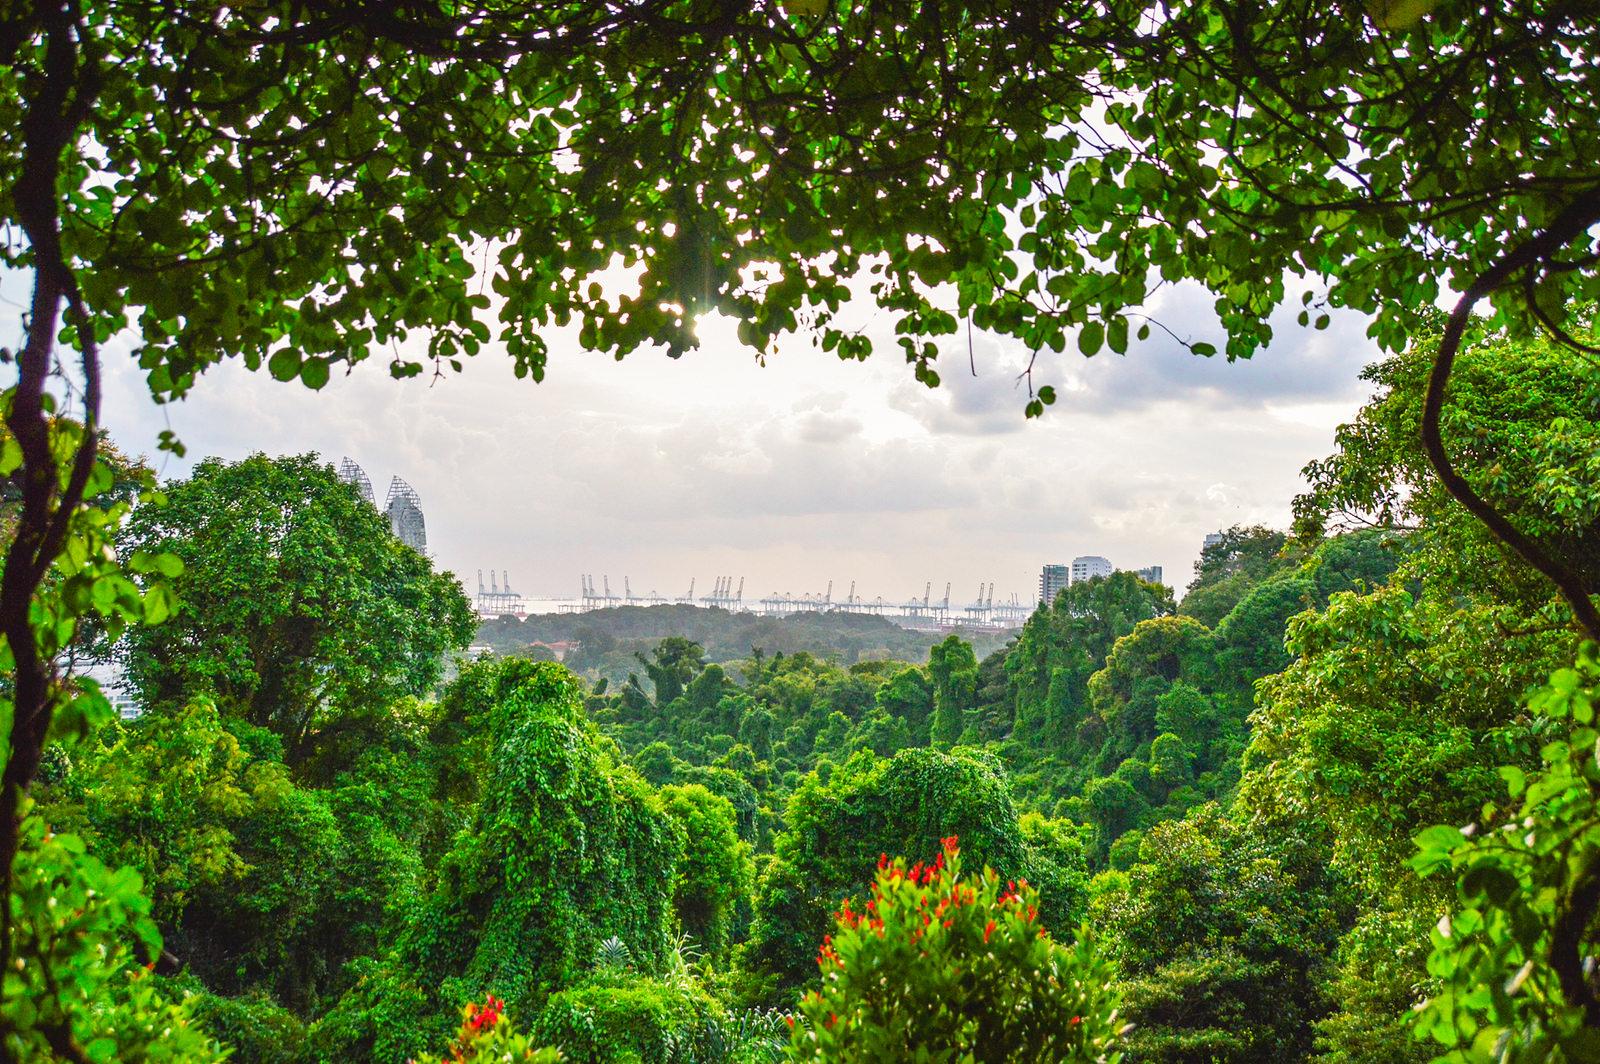 Mount Faber & the Henderson Waves Bridge – Southern Ridges, Singapore